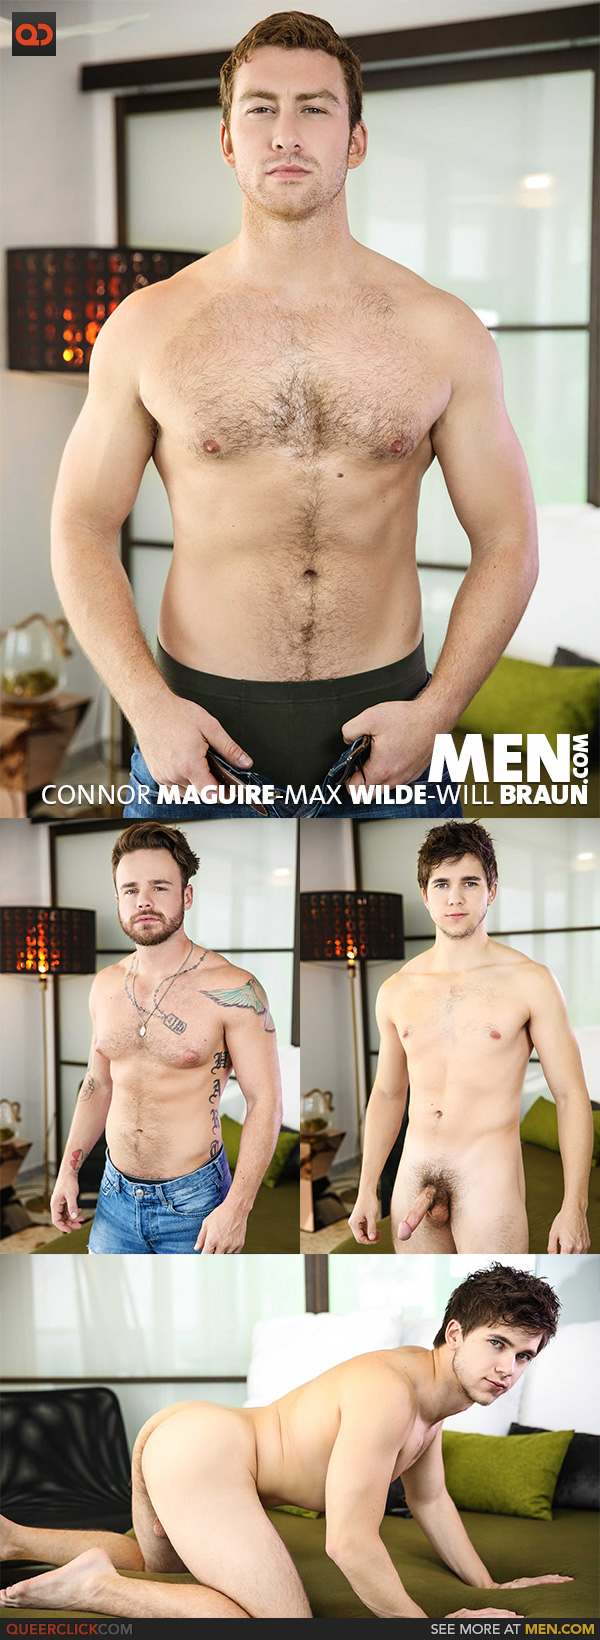 Men.com:  Connor Maguire, Max Wilde and Will Braun